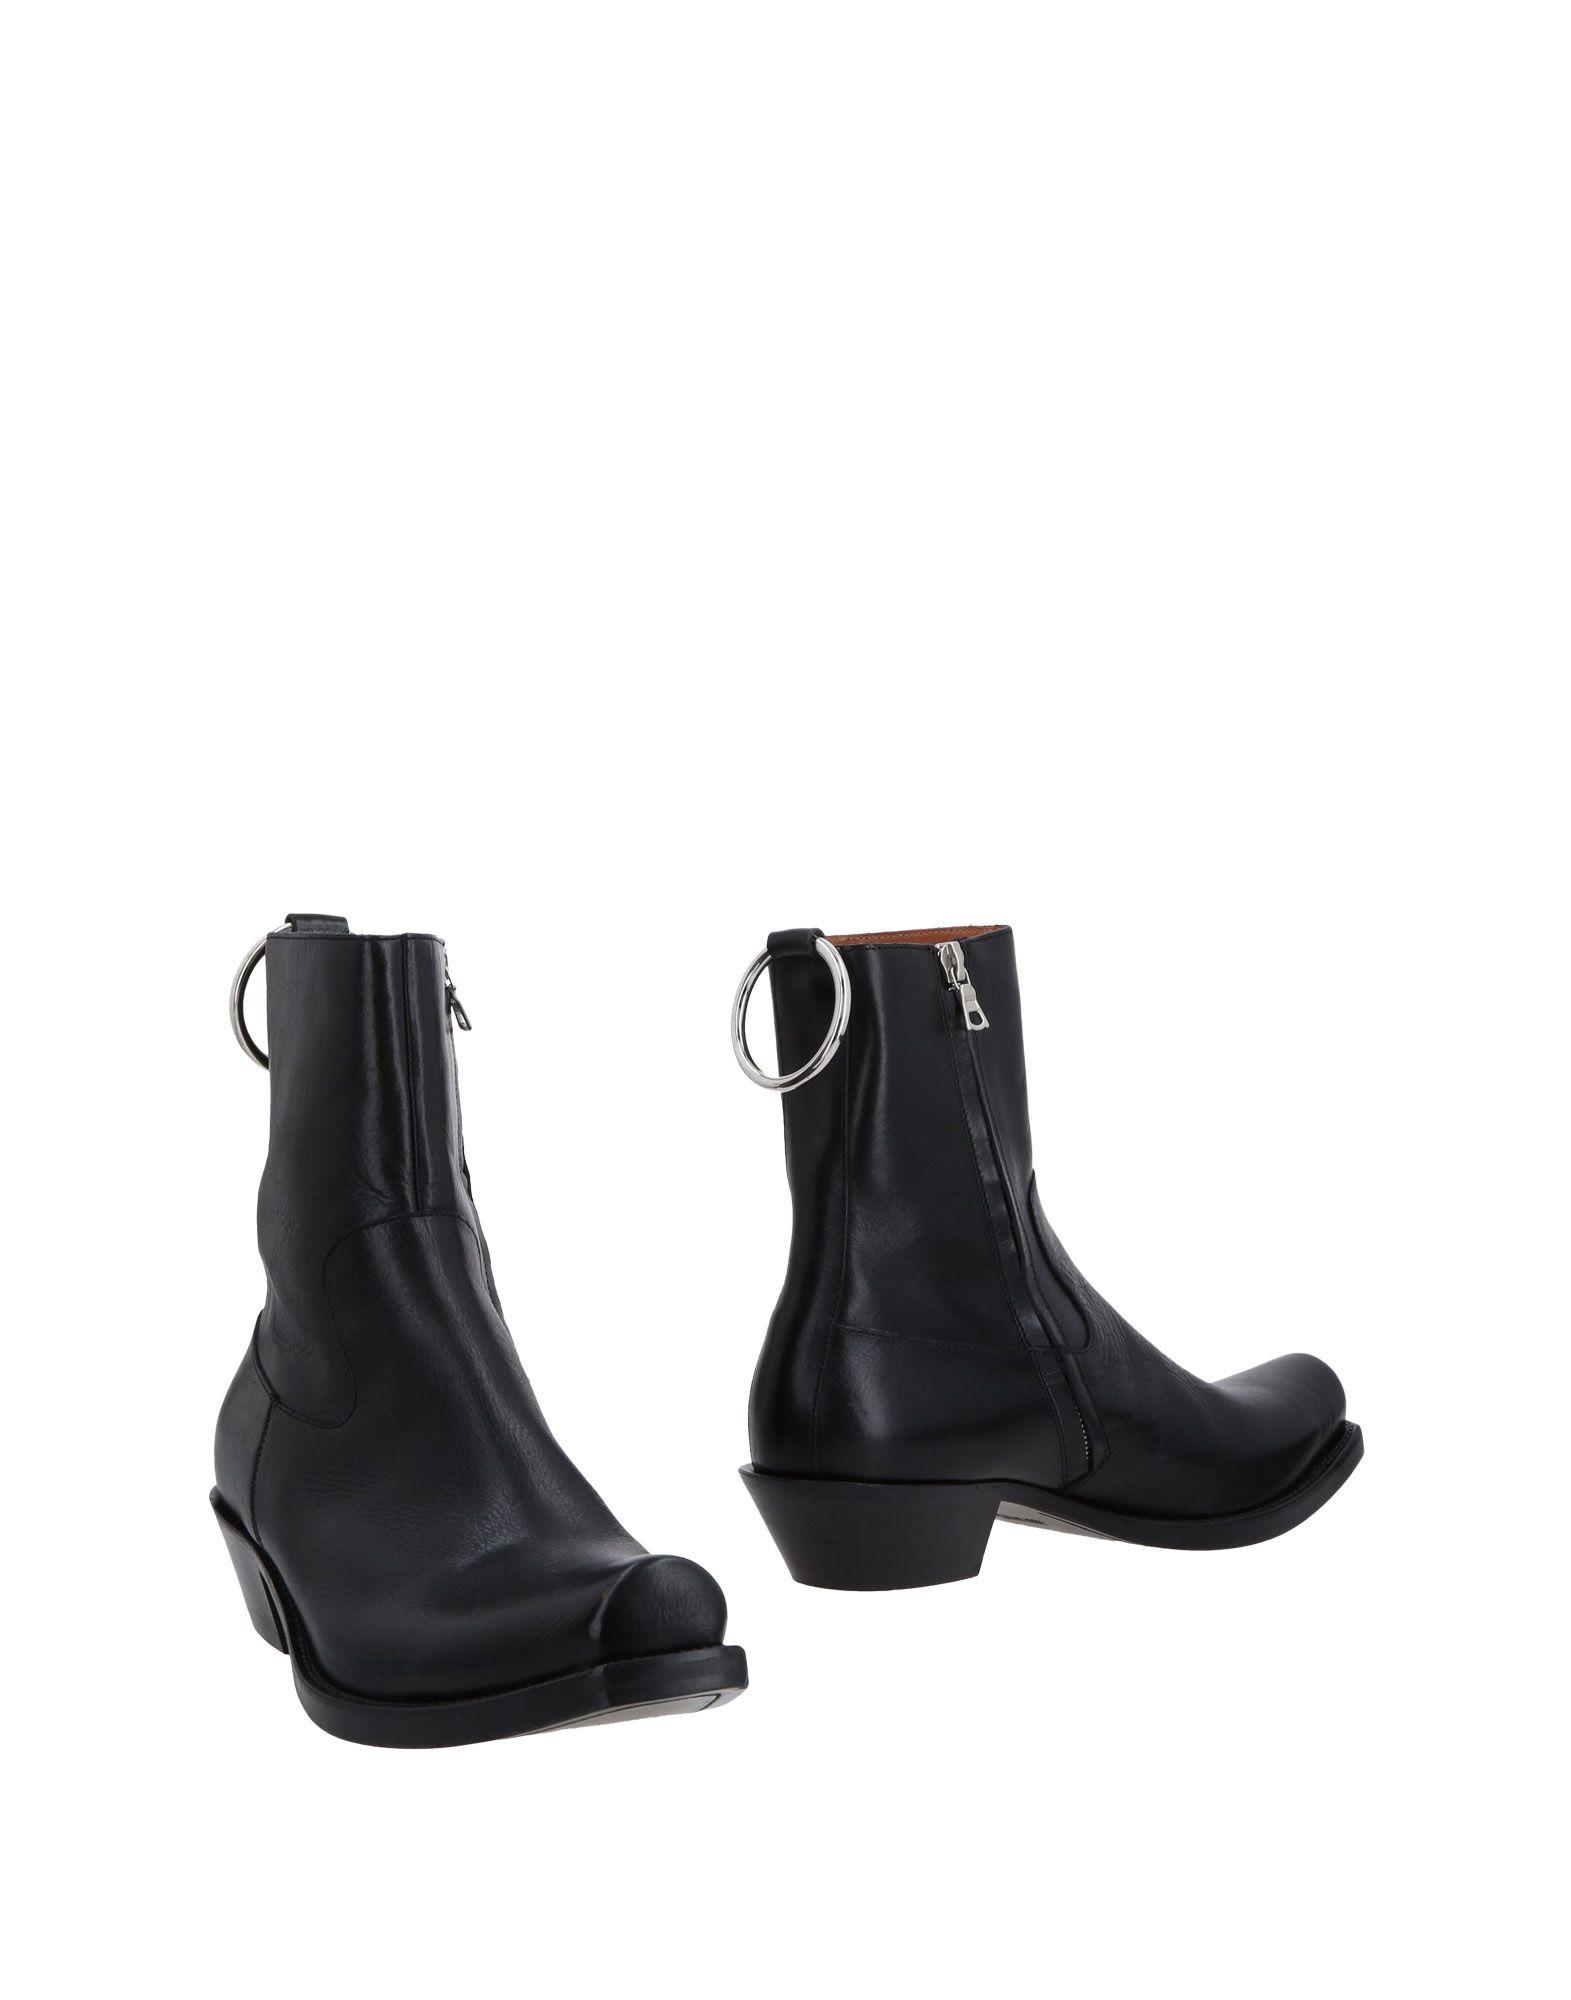 Demna Gvasalia Stiefelette Herren  11480794FG Gute Qualität beliebte Schuhe Schuhe Schuhe e99877